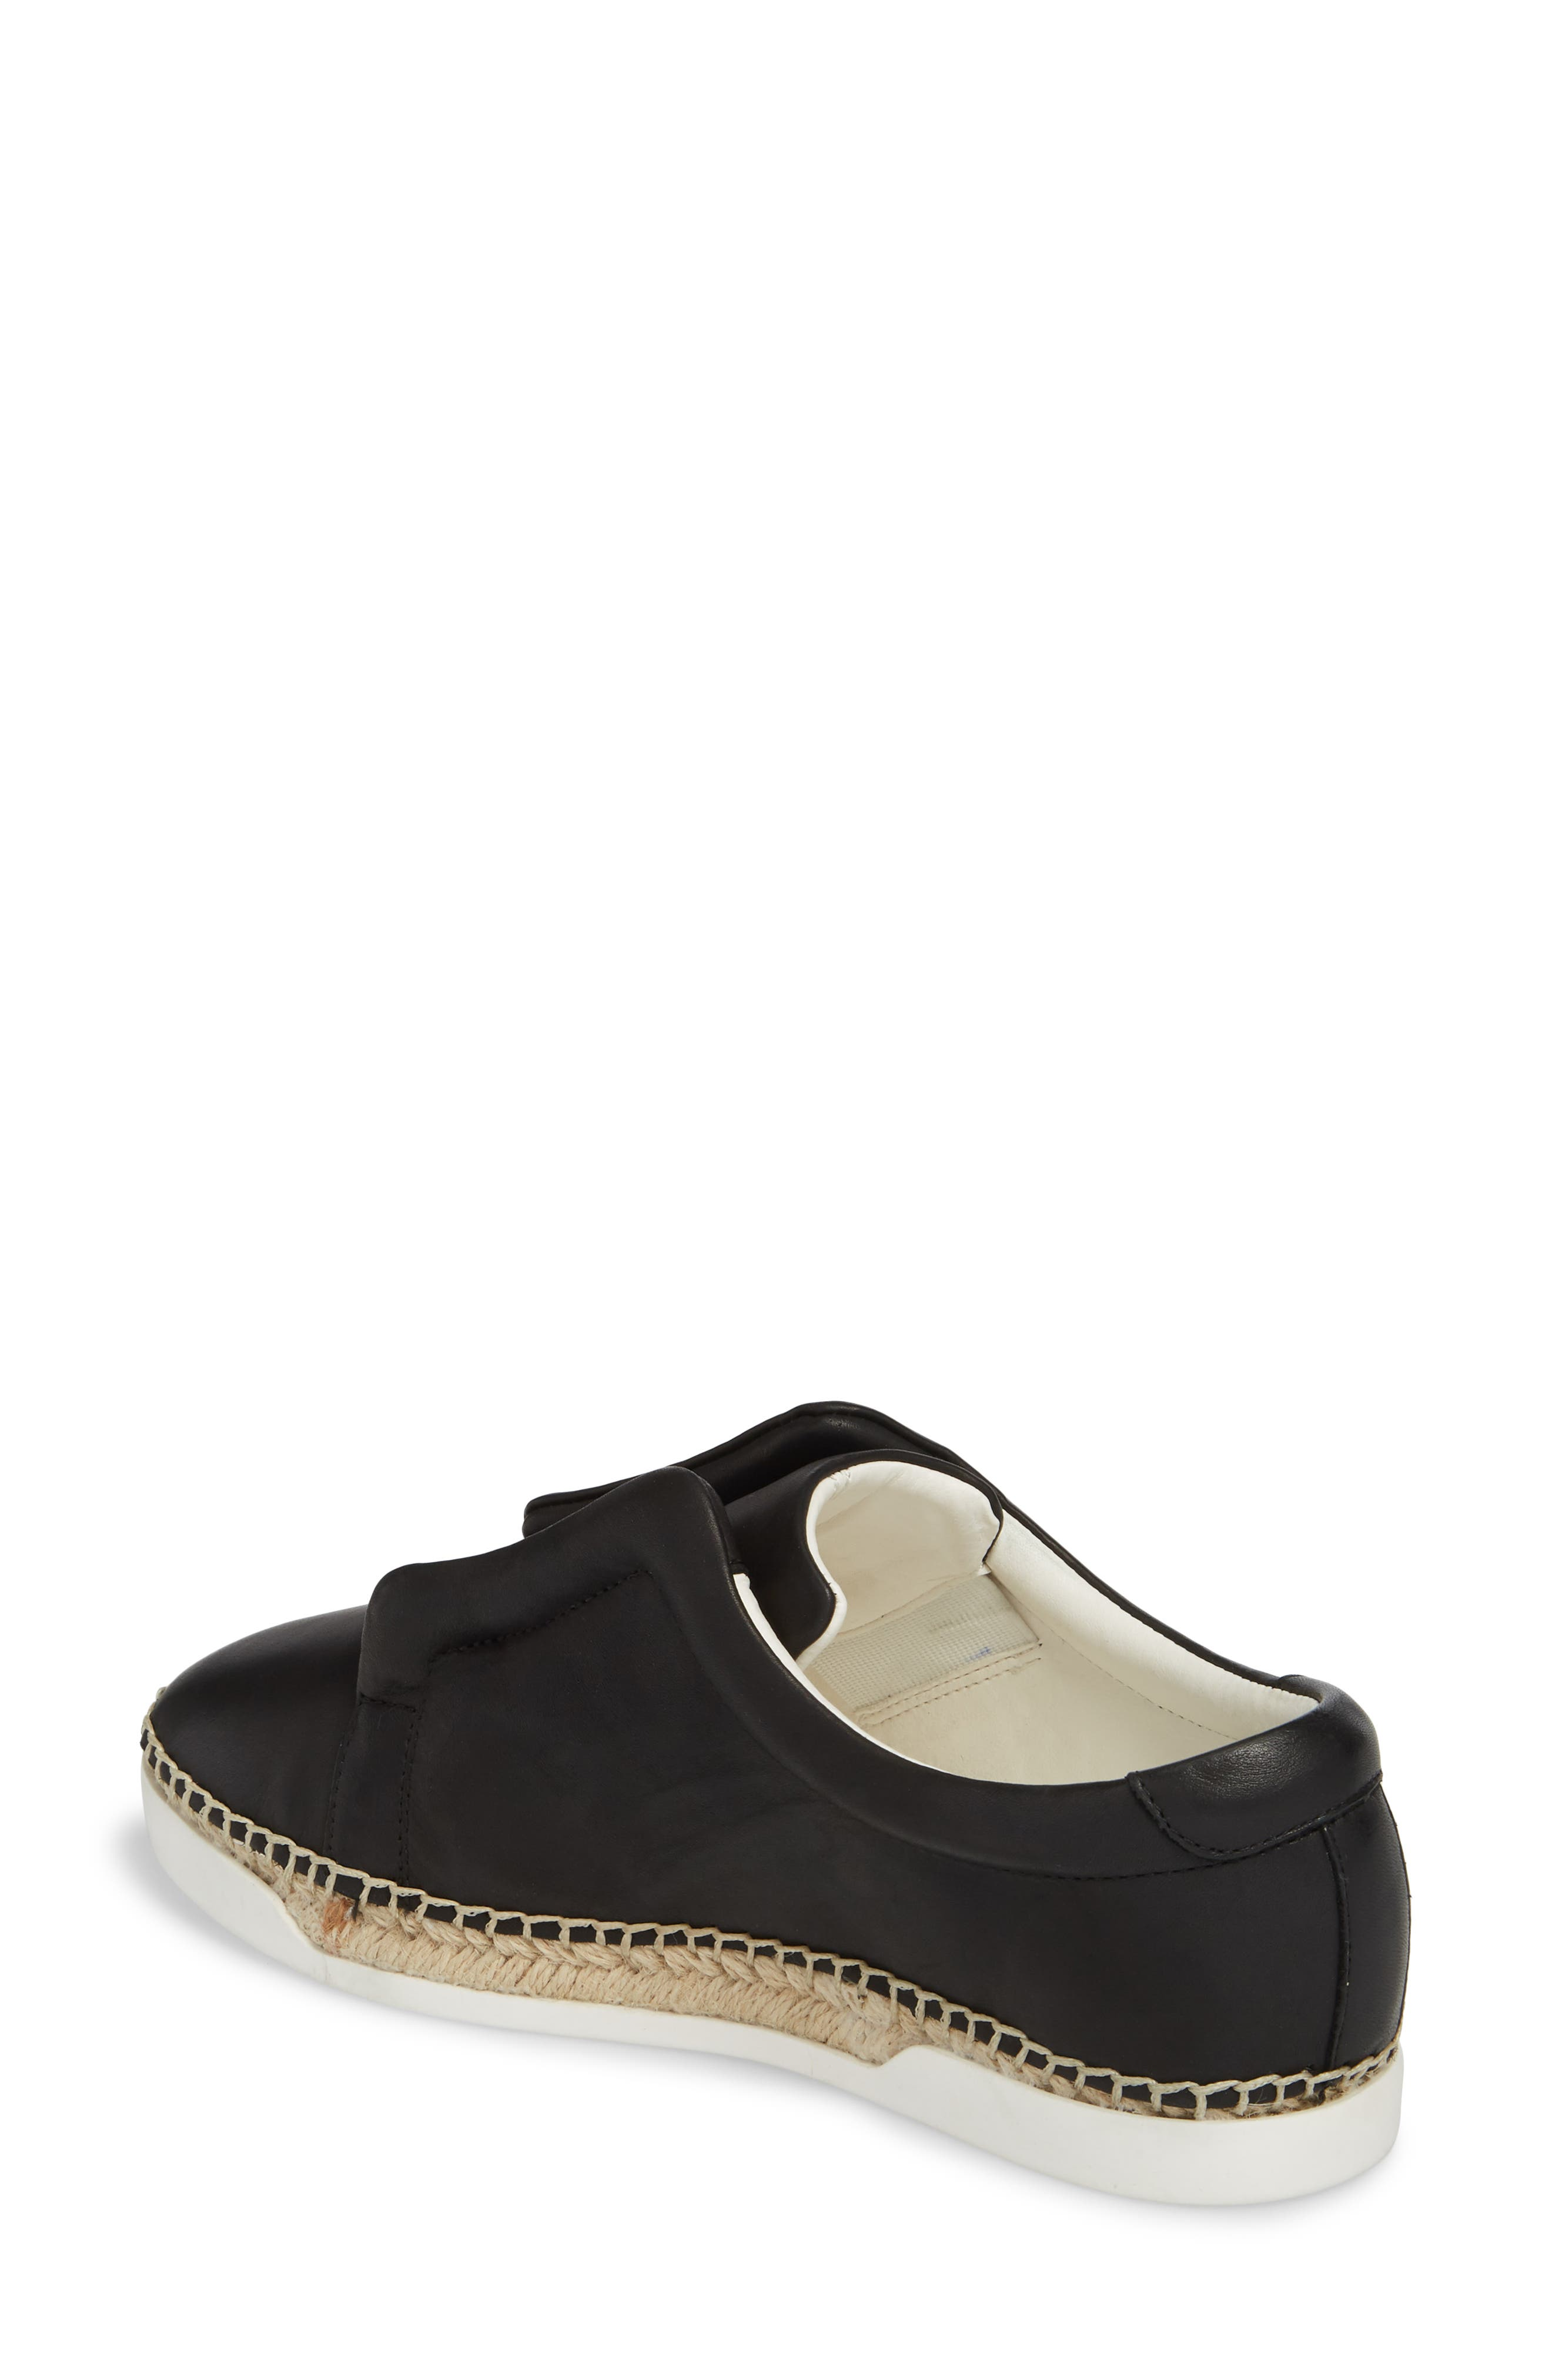 M4D3 Elizabeth Espadrille Slip-On Sneaker,                             Alternate thumbnail 2, color,                             Black Leather